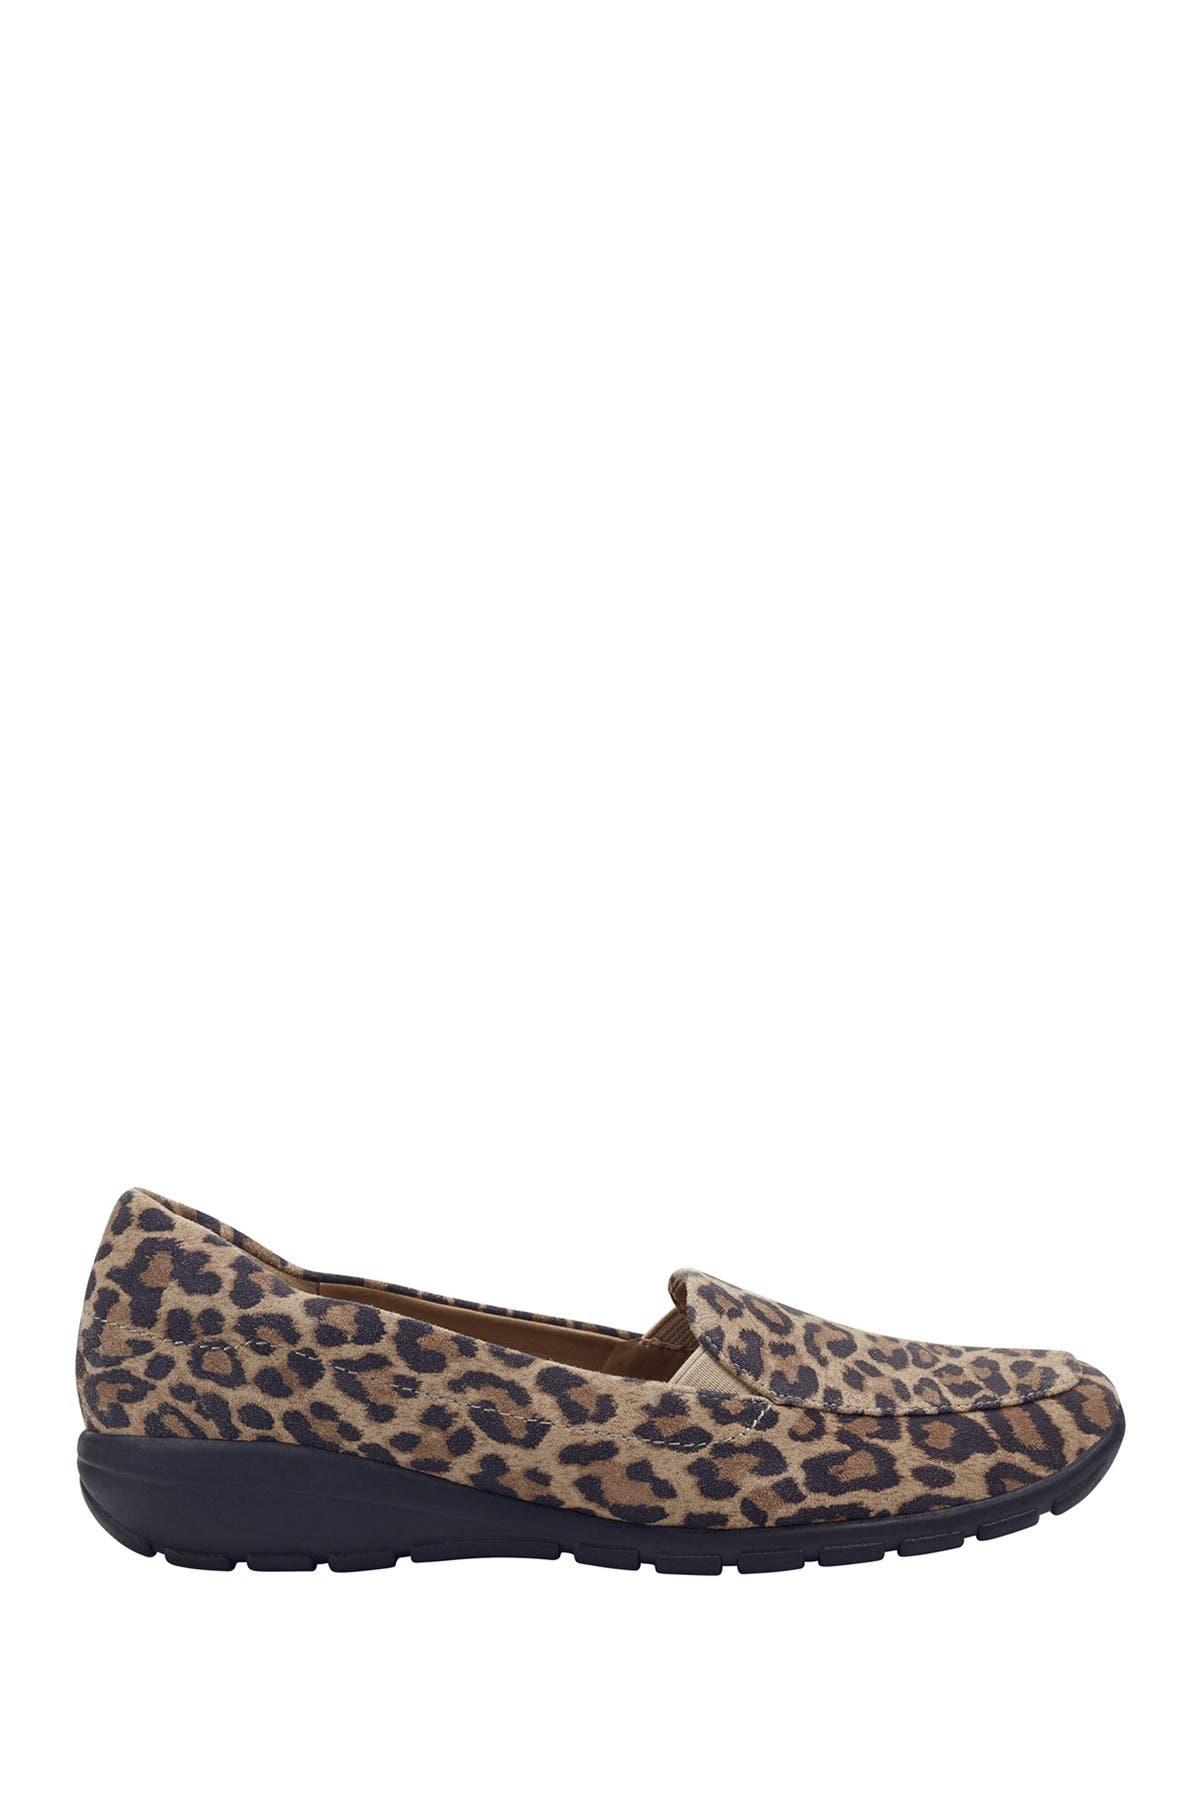 easy spirit leopard print shoes